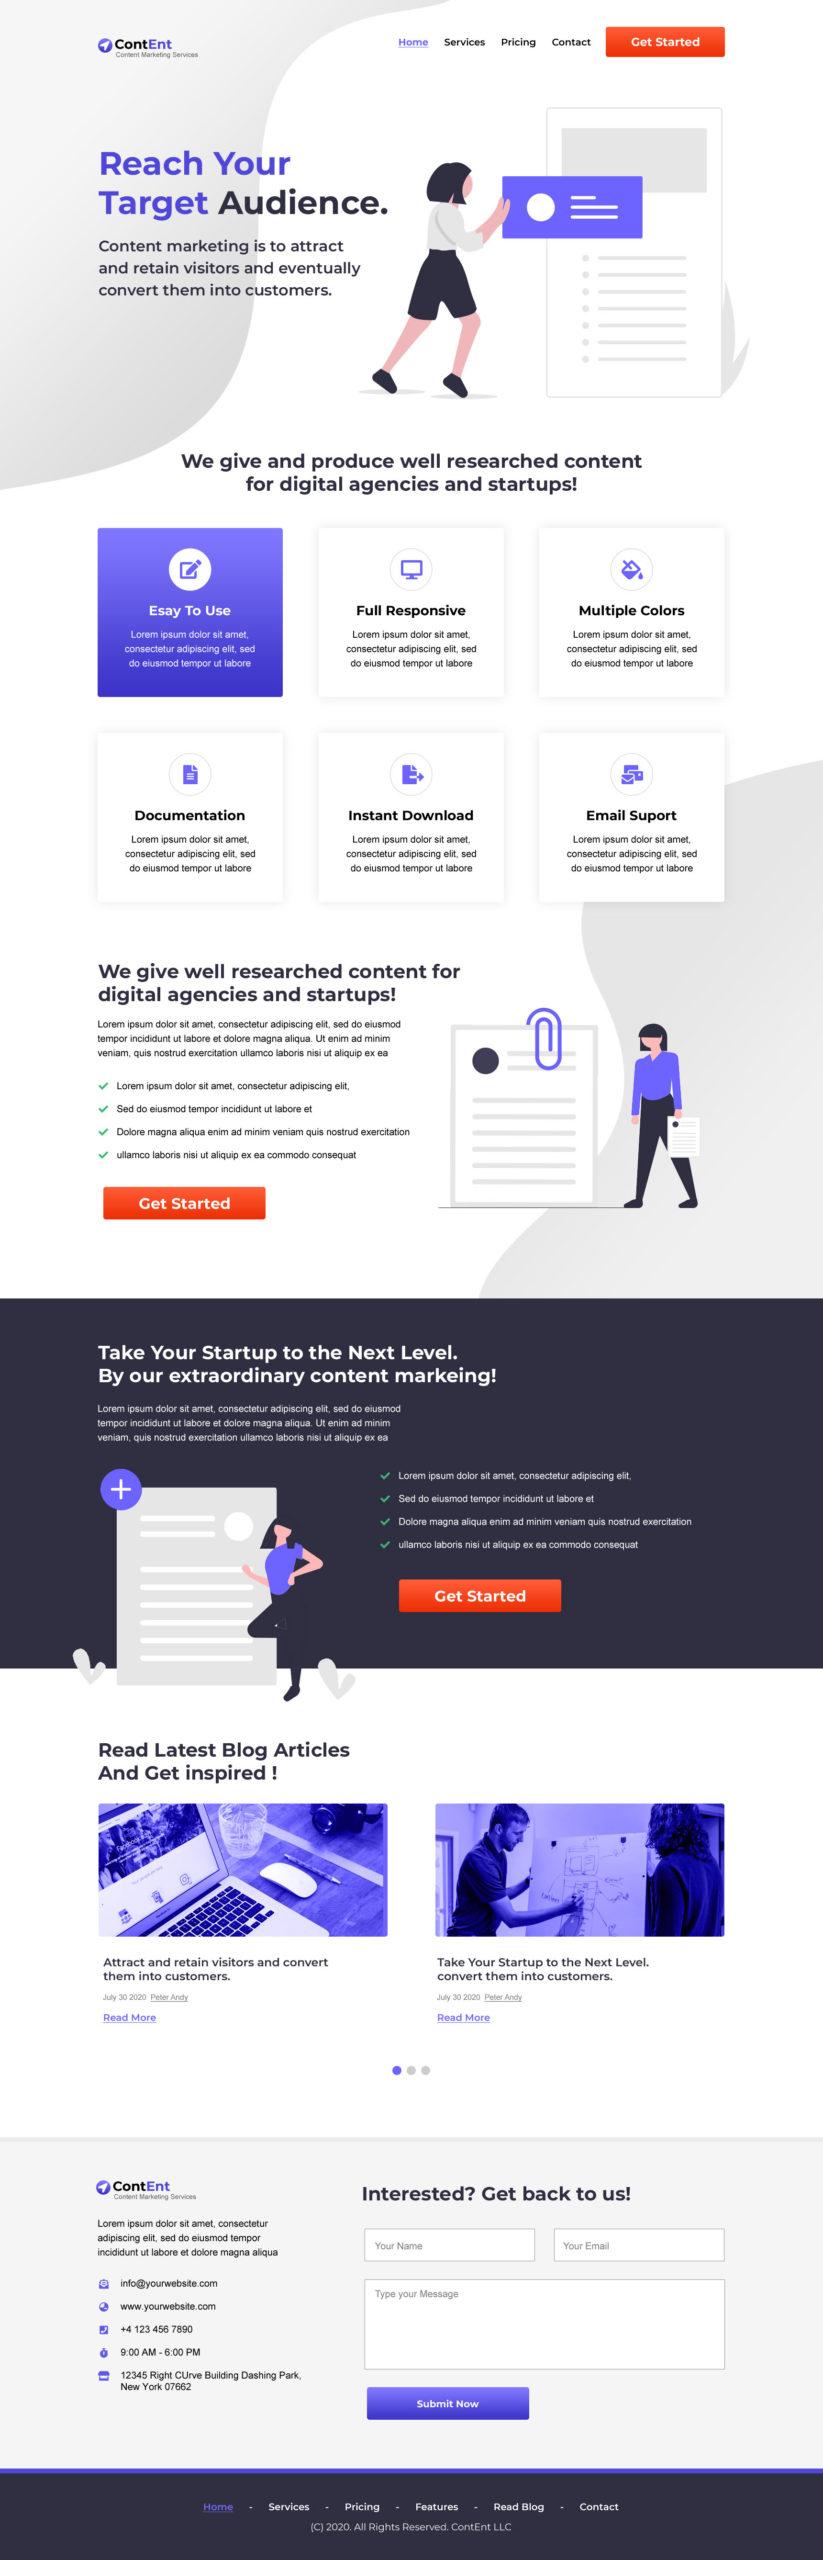 Content Marketing Startup Landing Page